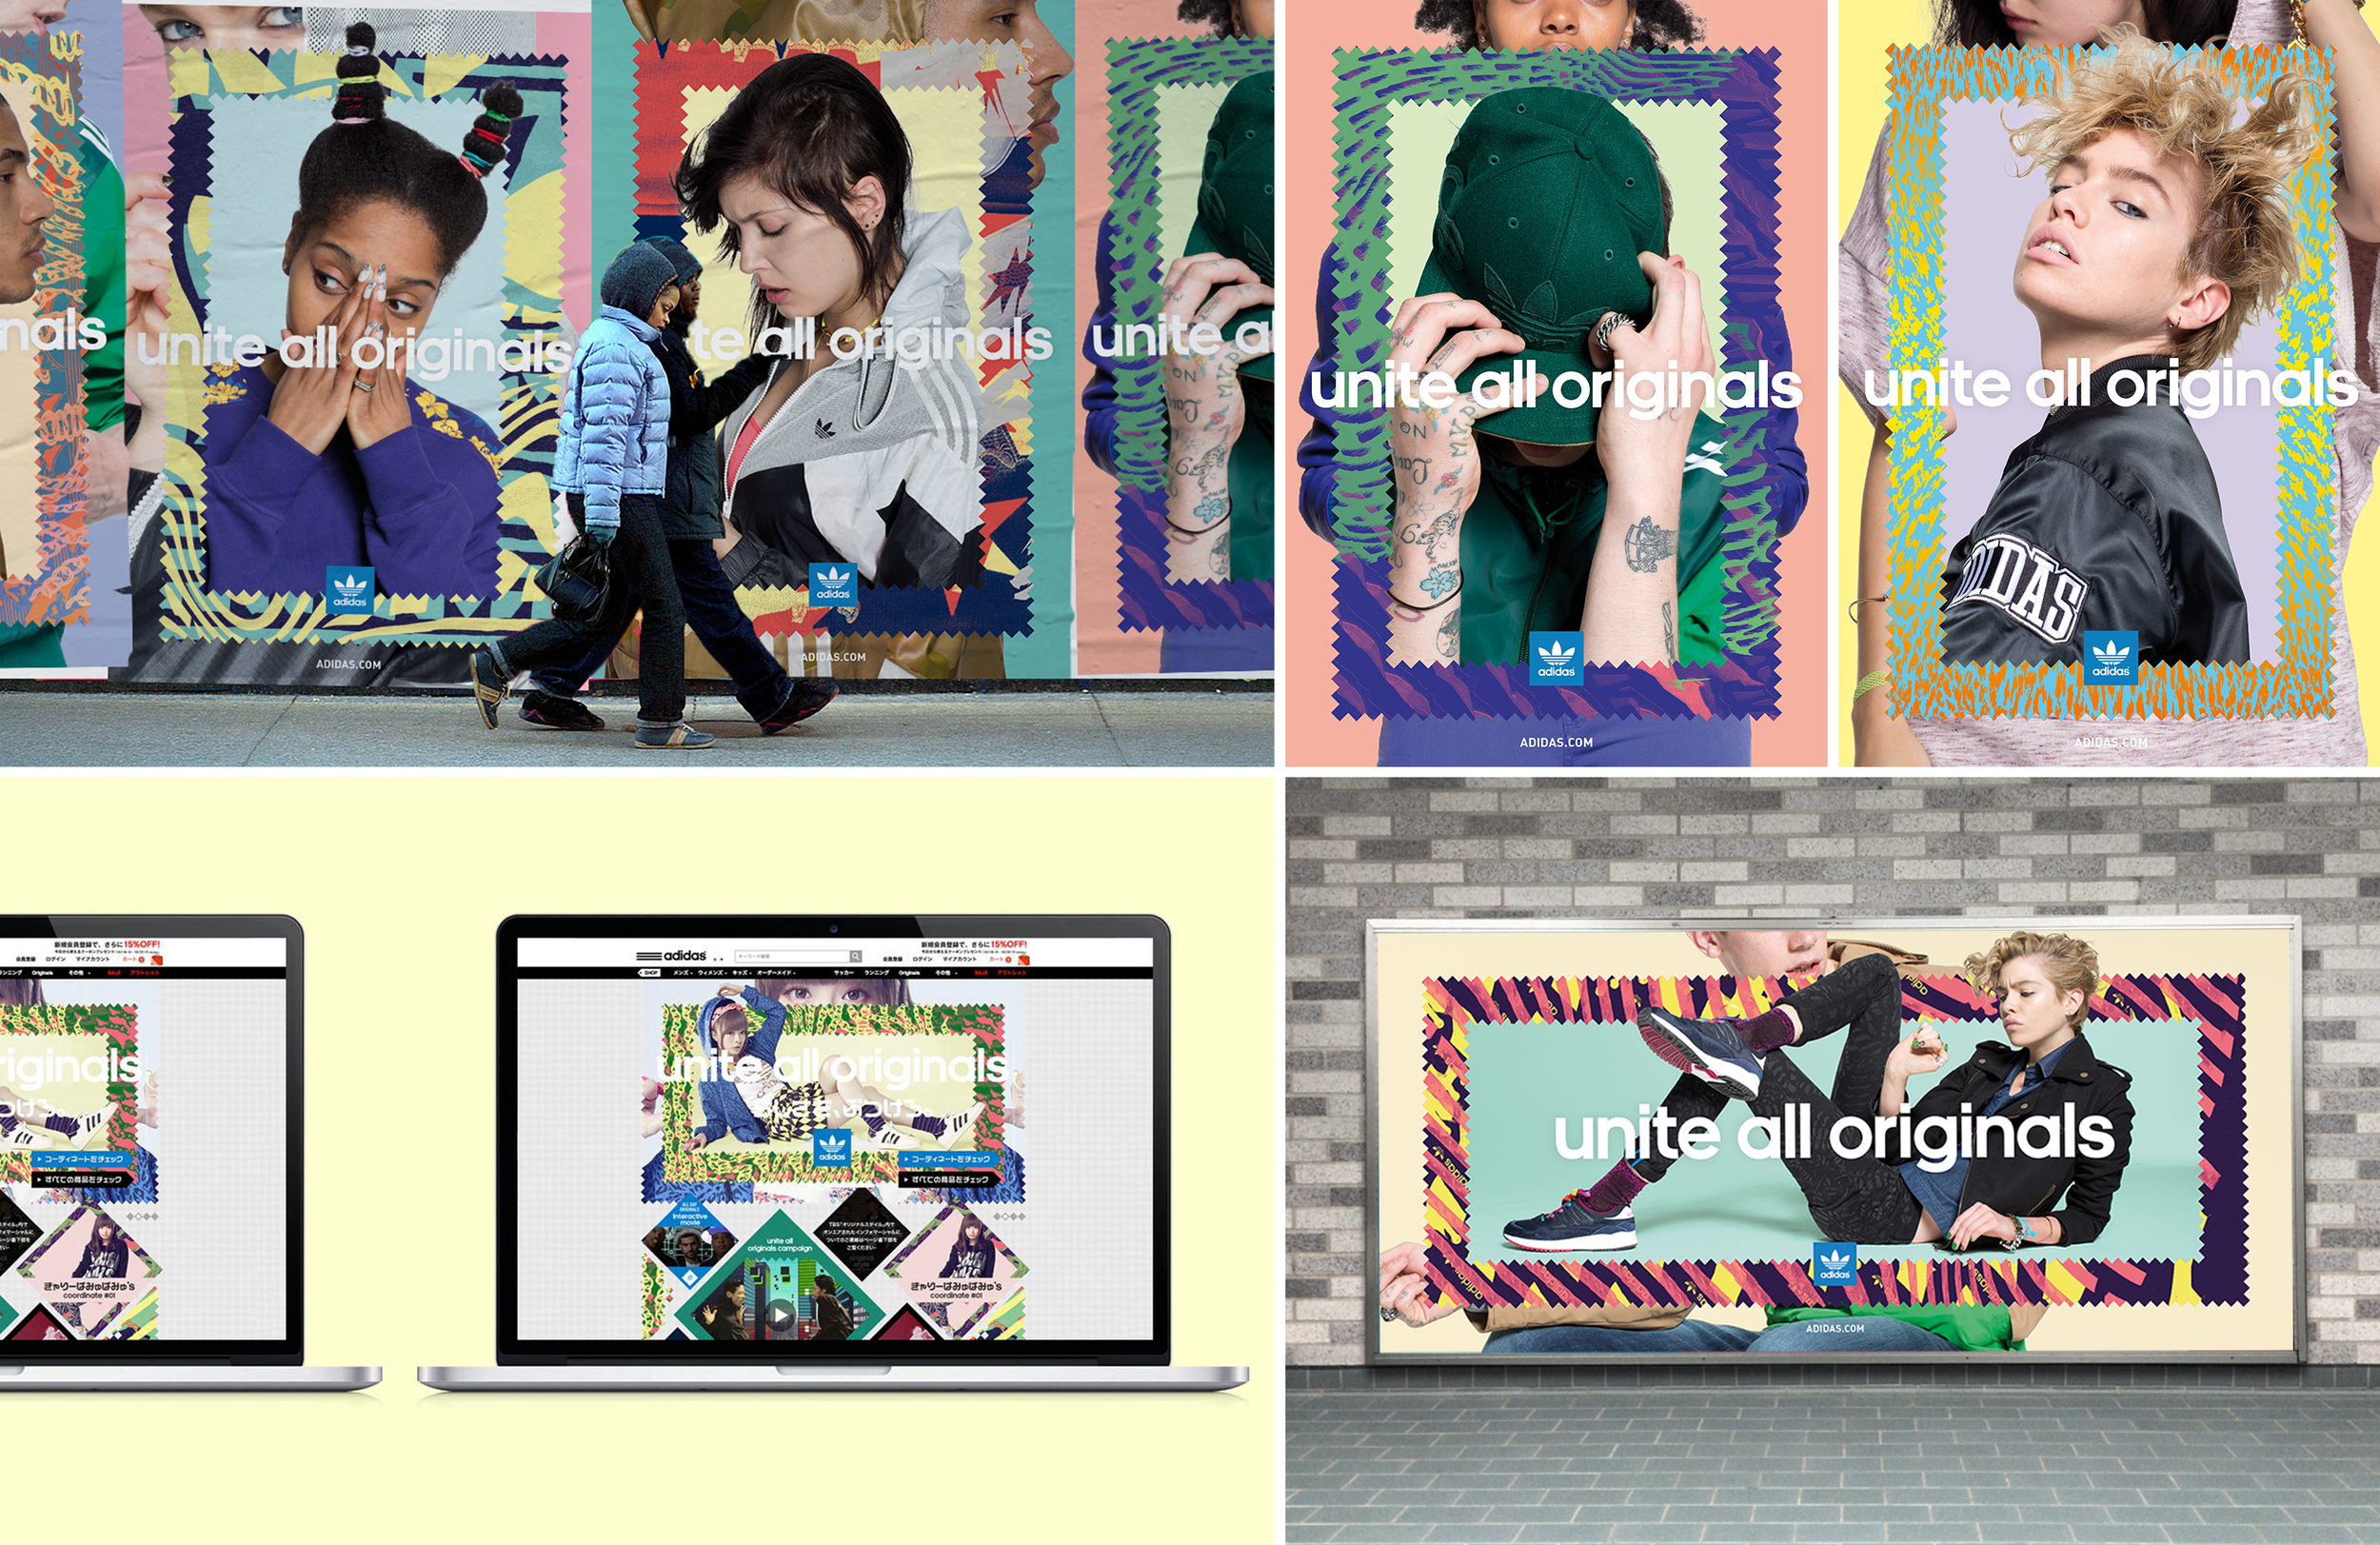 adidas</br>Unite all Originals</br>Campaign visuals</br>(2013)